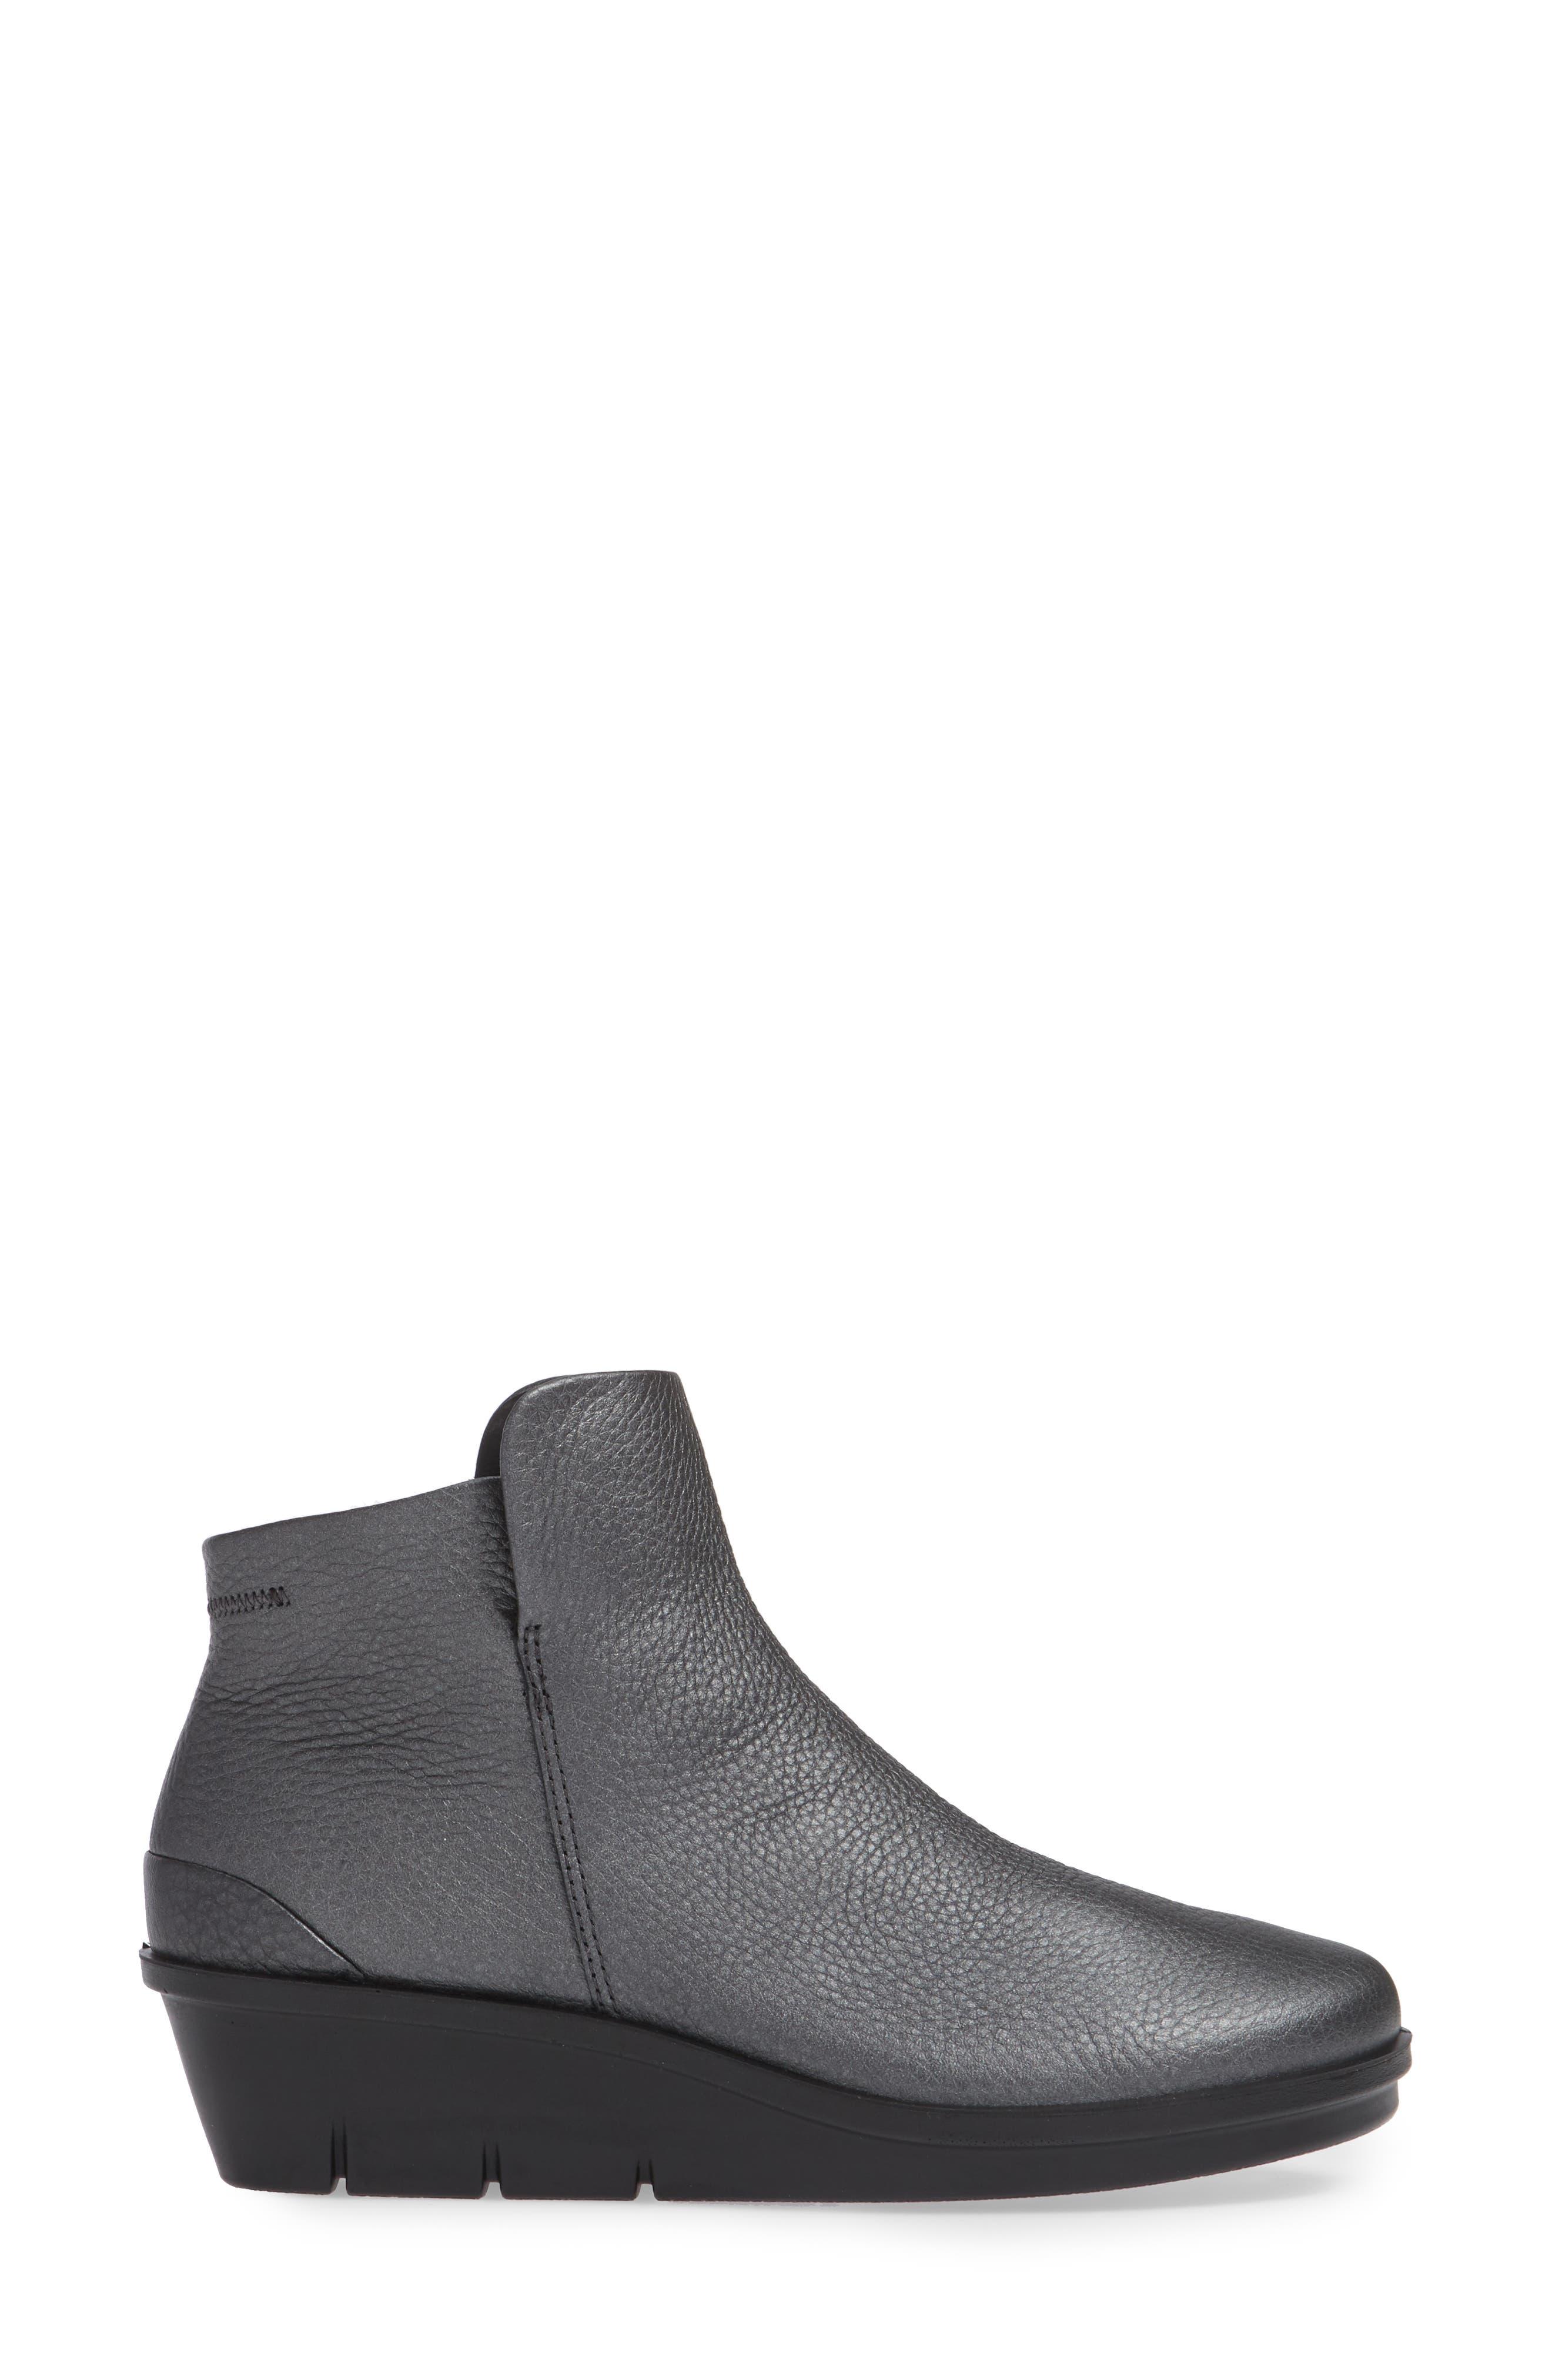 Skyler Wedge Boot,                             Alternate thumbnail 3, color,                             BLACK/ DARK SILVER LEATHER